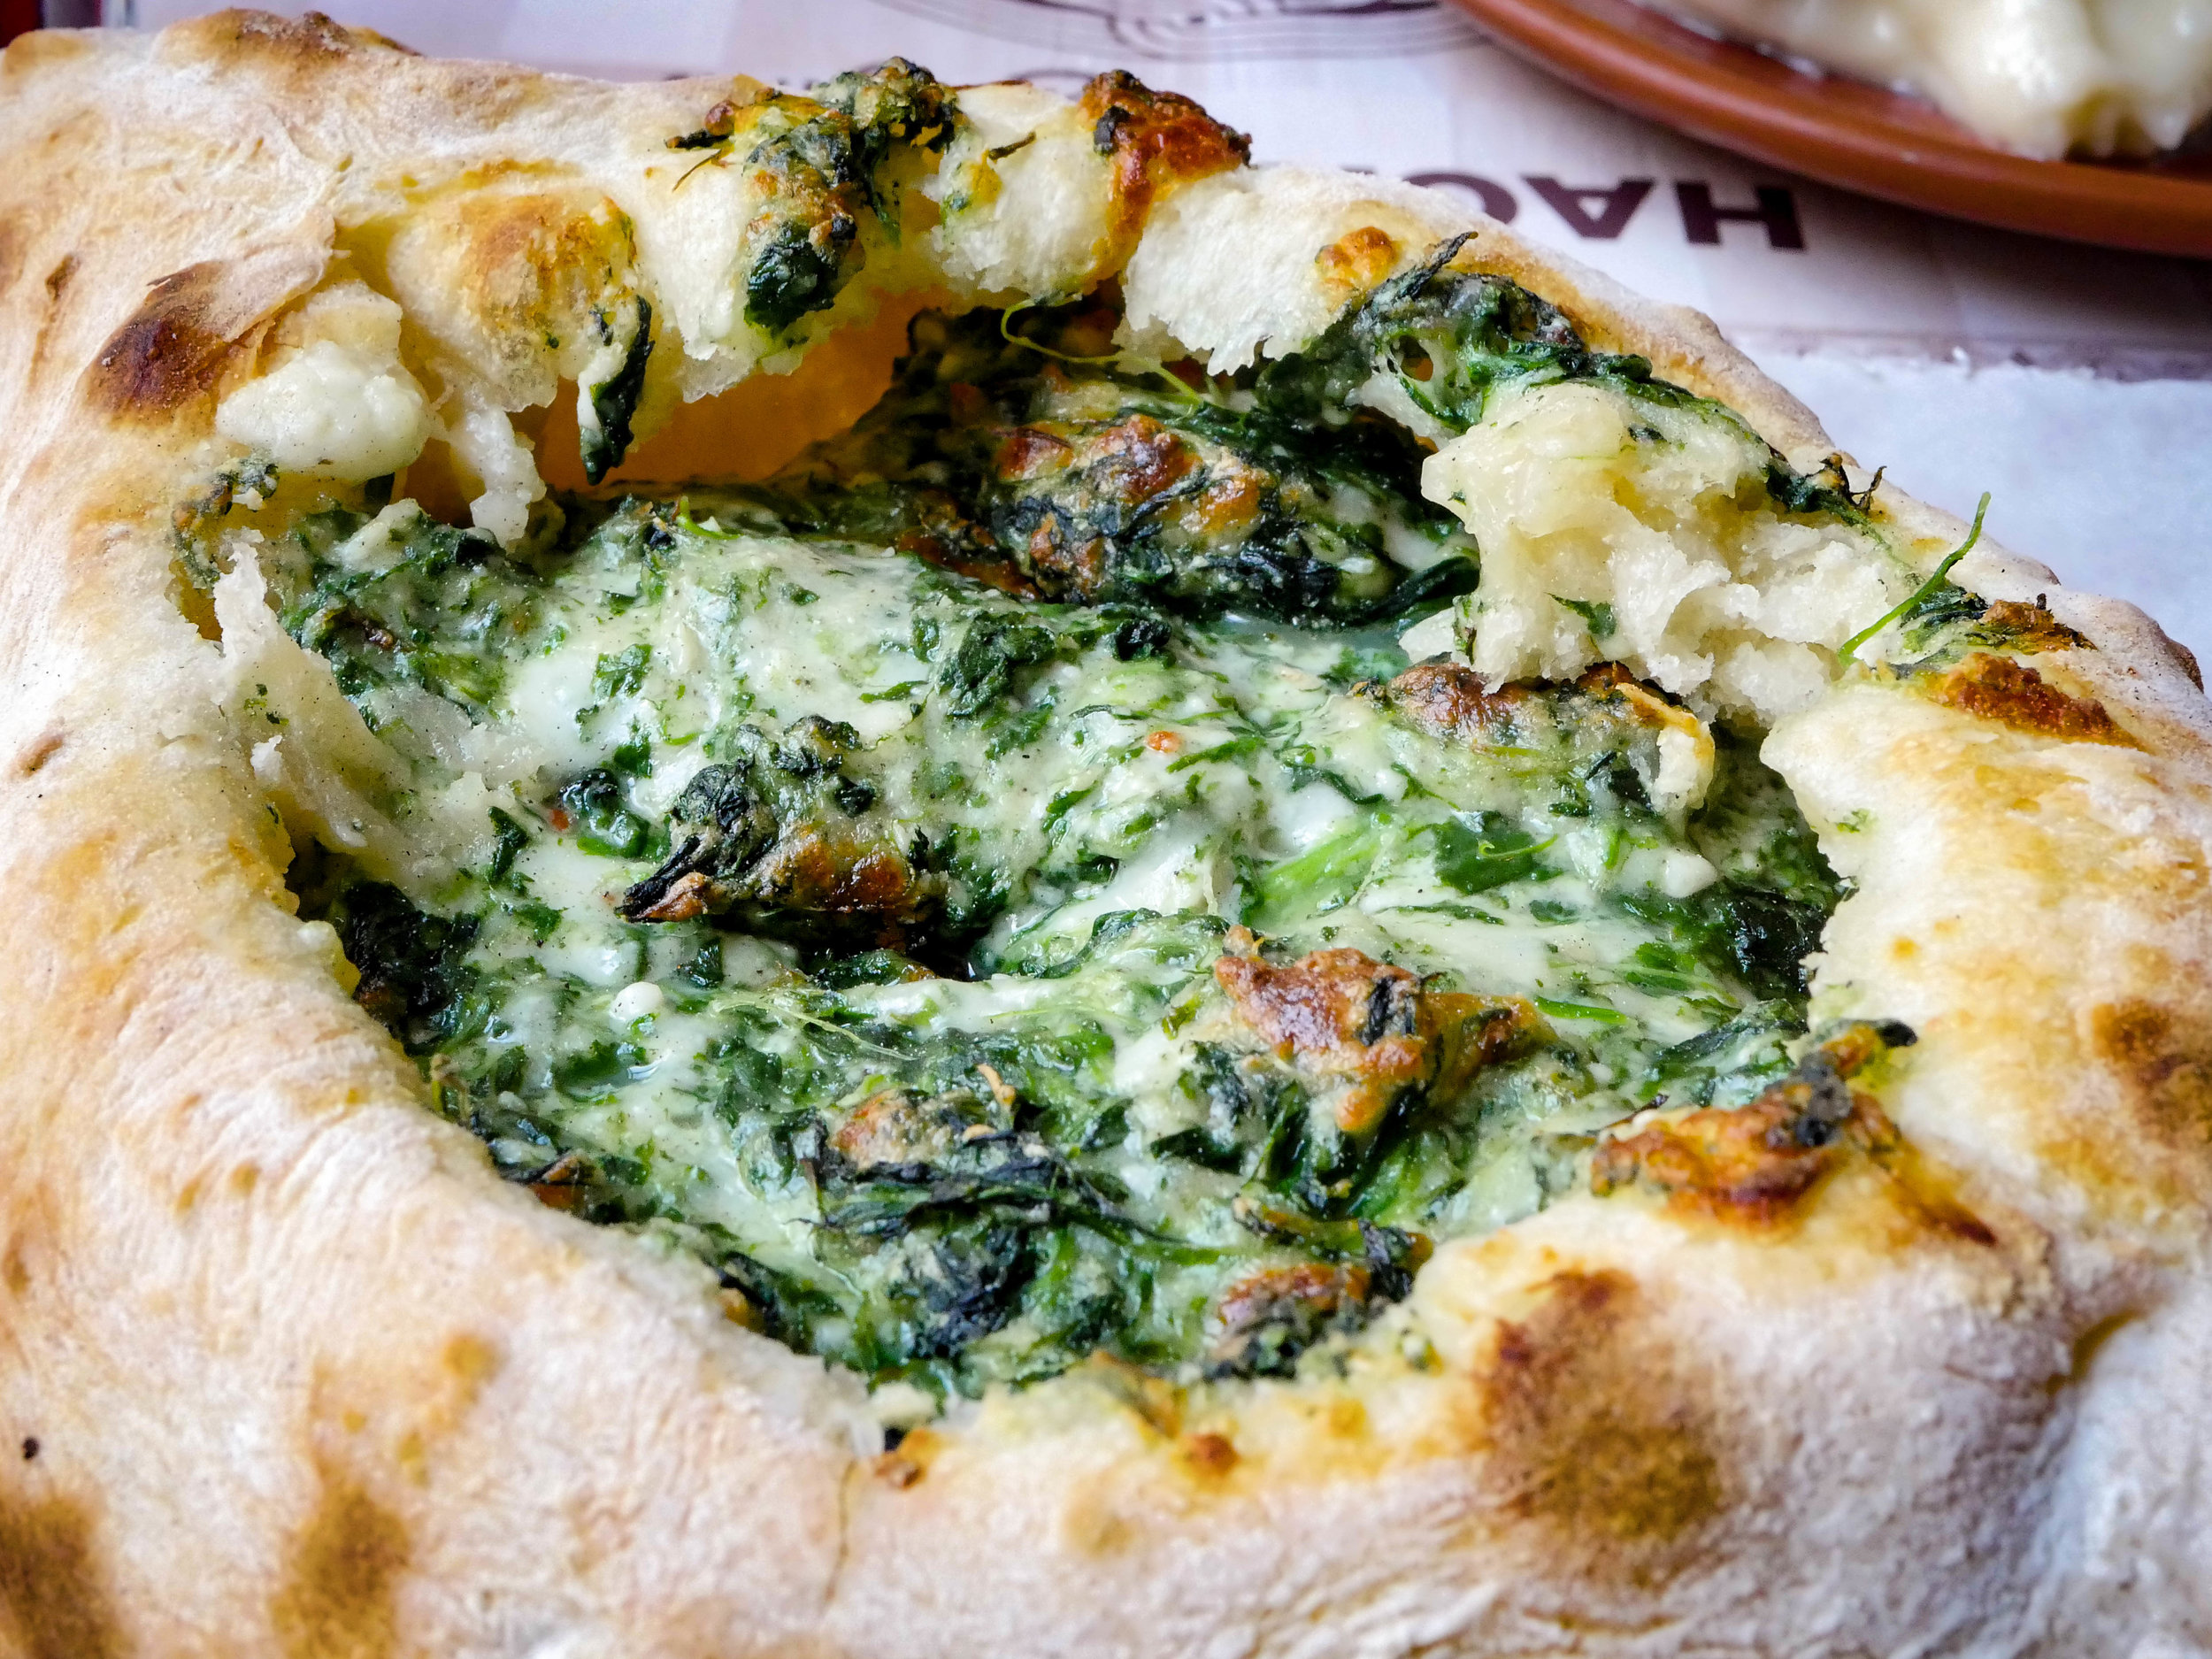 Spinach and cheese acharuli.